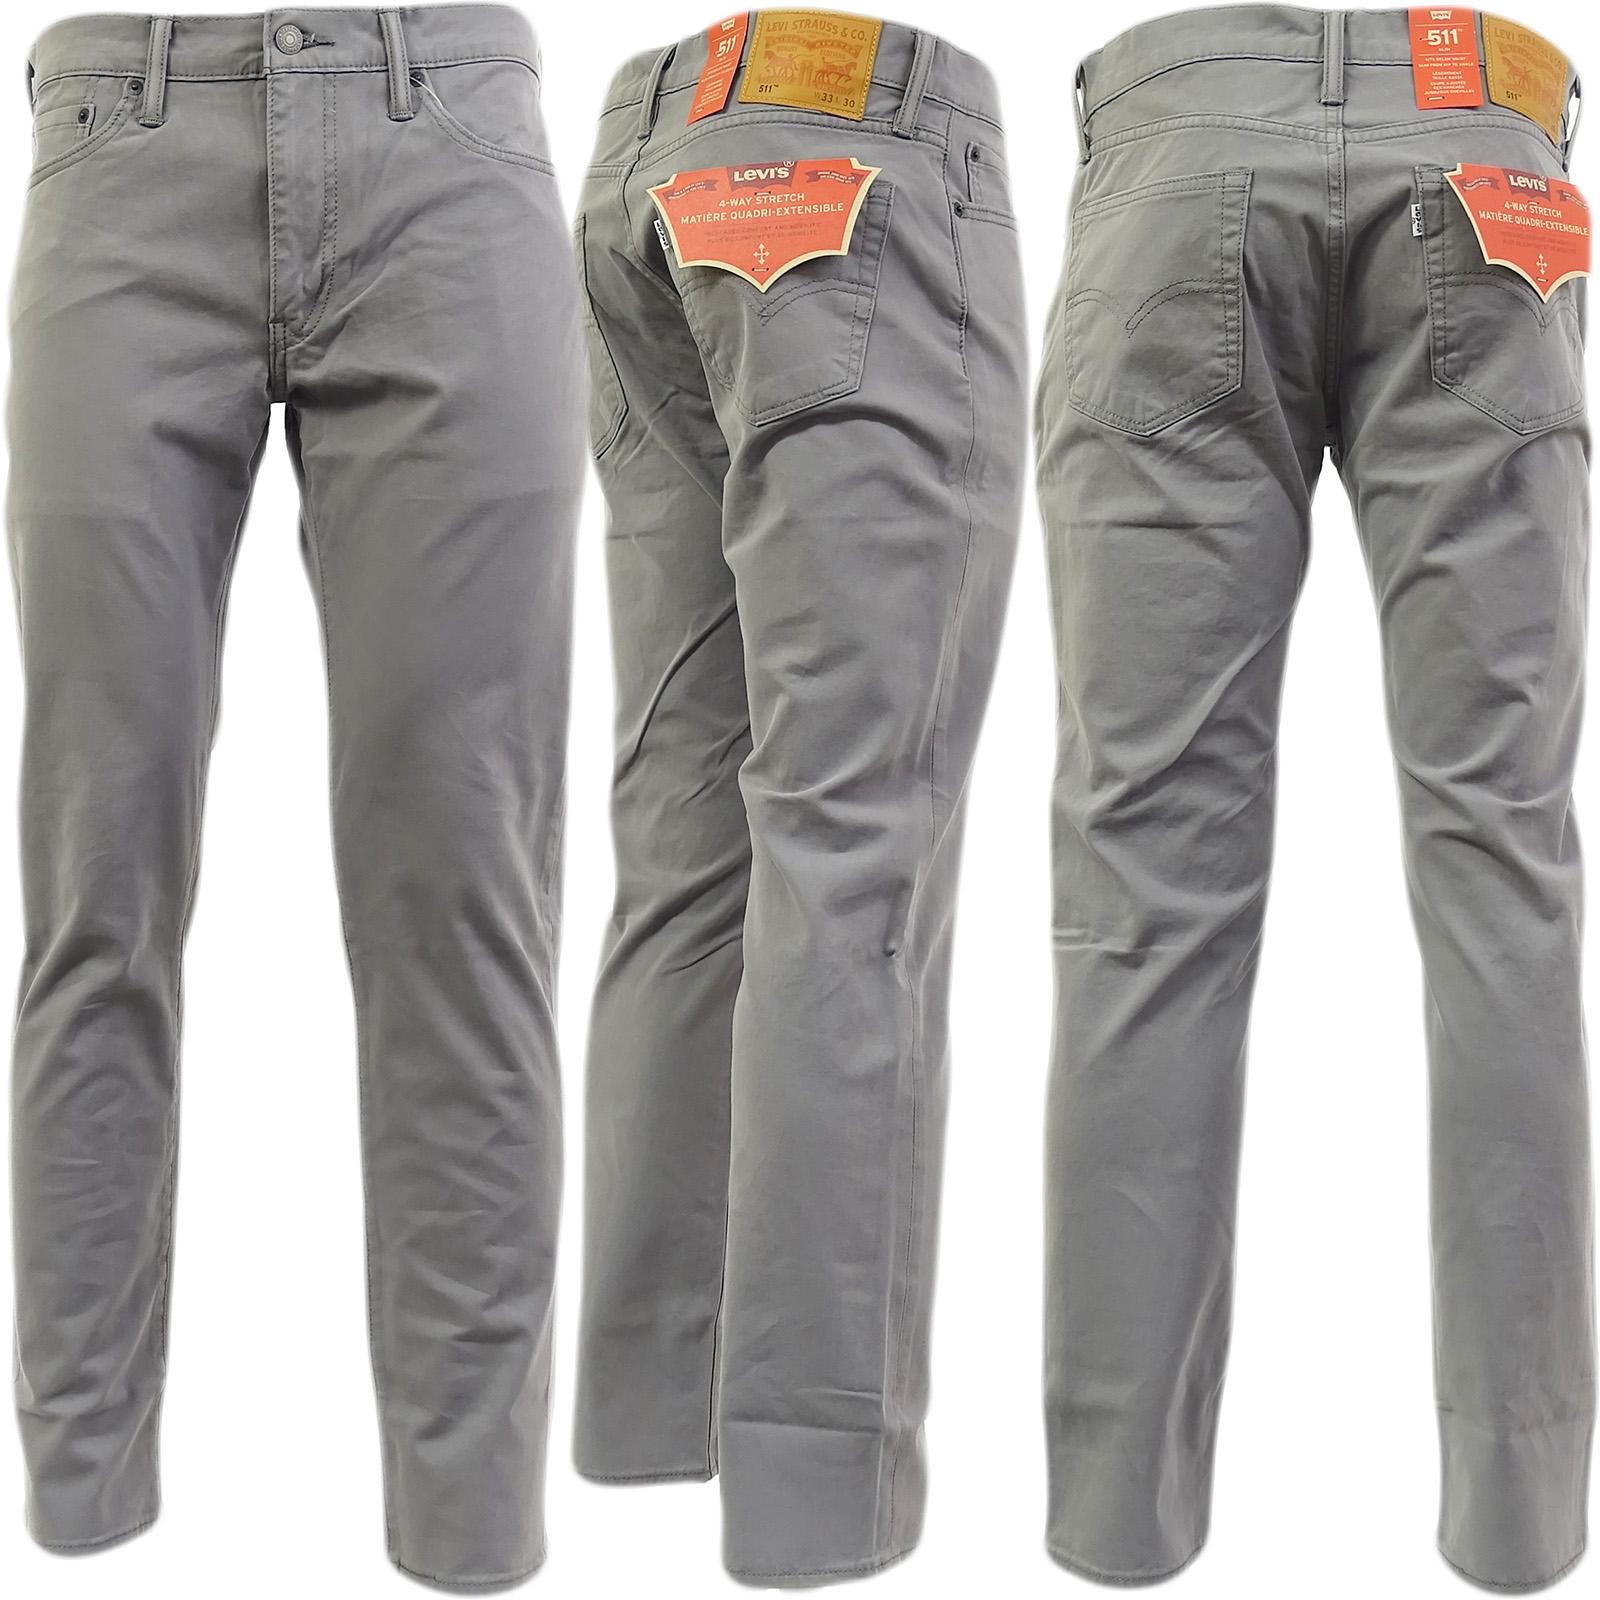 42c2df140e3 Levi Strauss 511 Slim Leg Jean Grey Chino Jean Steel Grey Grey | eBay